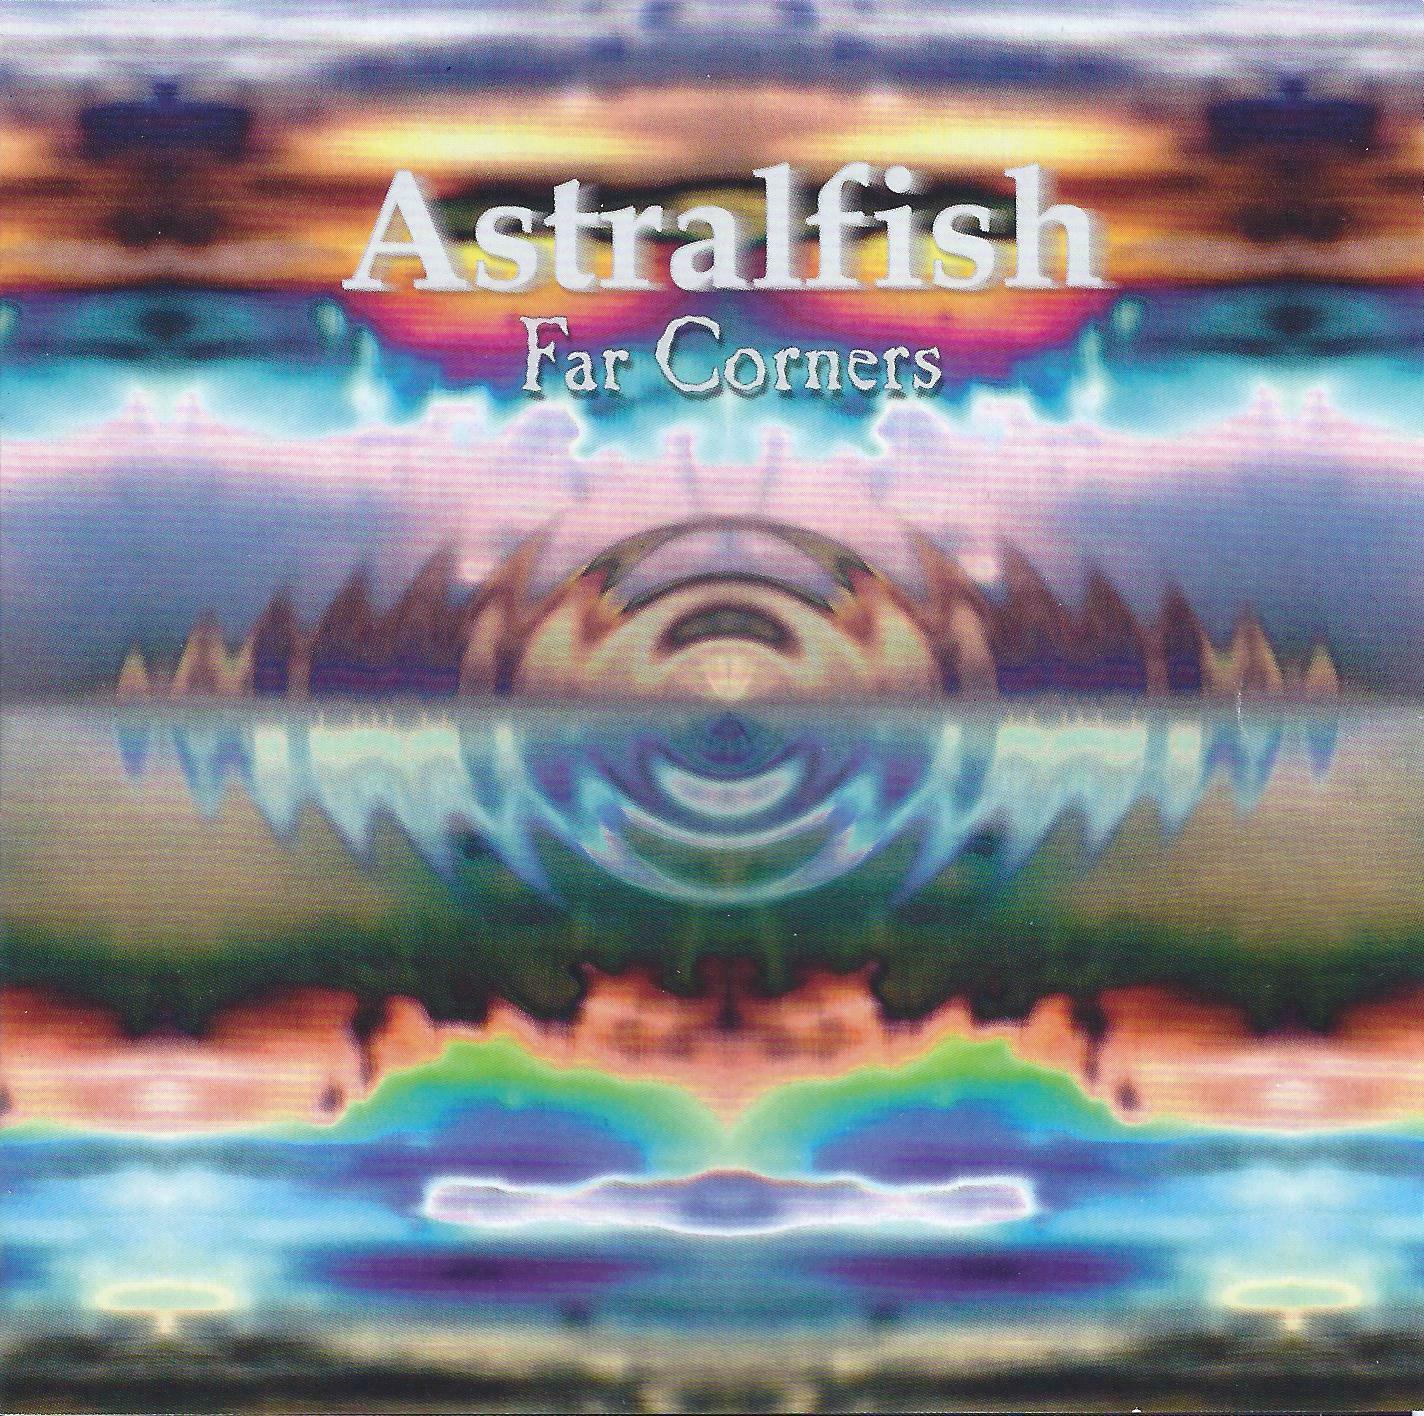 [Astralfish]